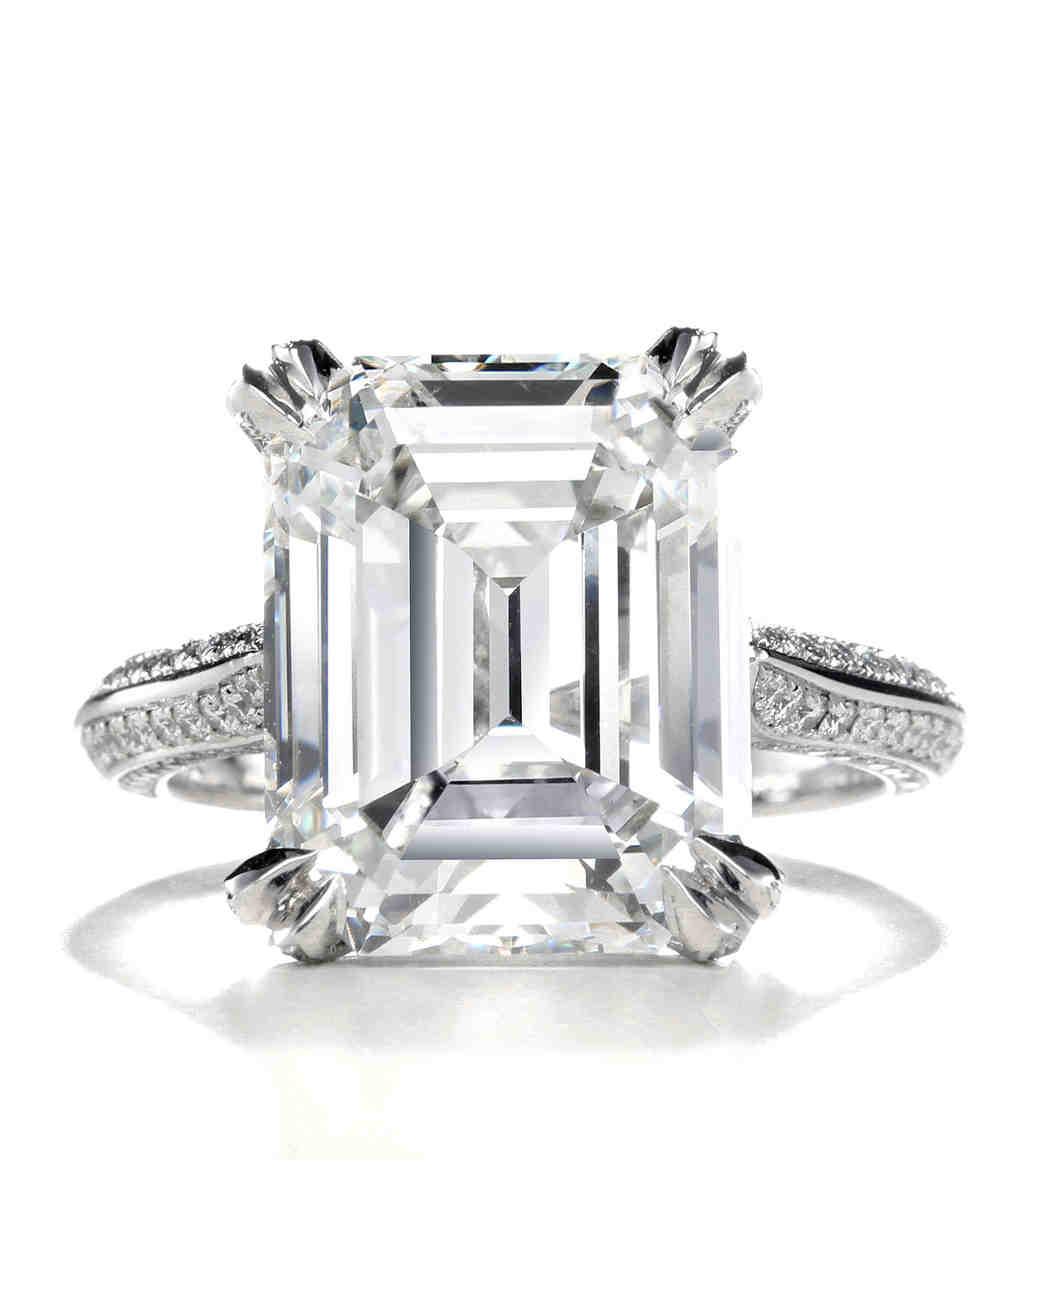 celebrity-rings-forevermark-exceptional-diamond-premier-gem-mariah-carey-0316.jpg